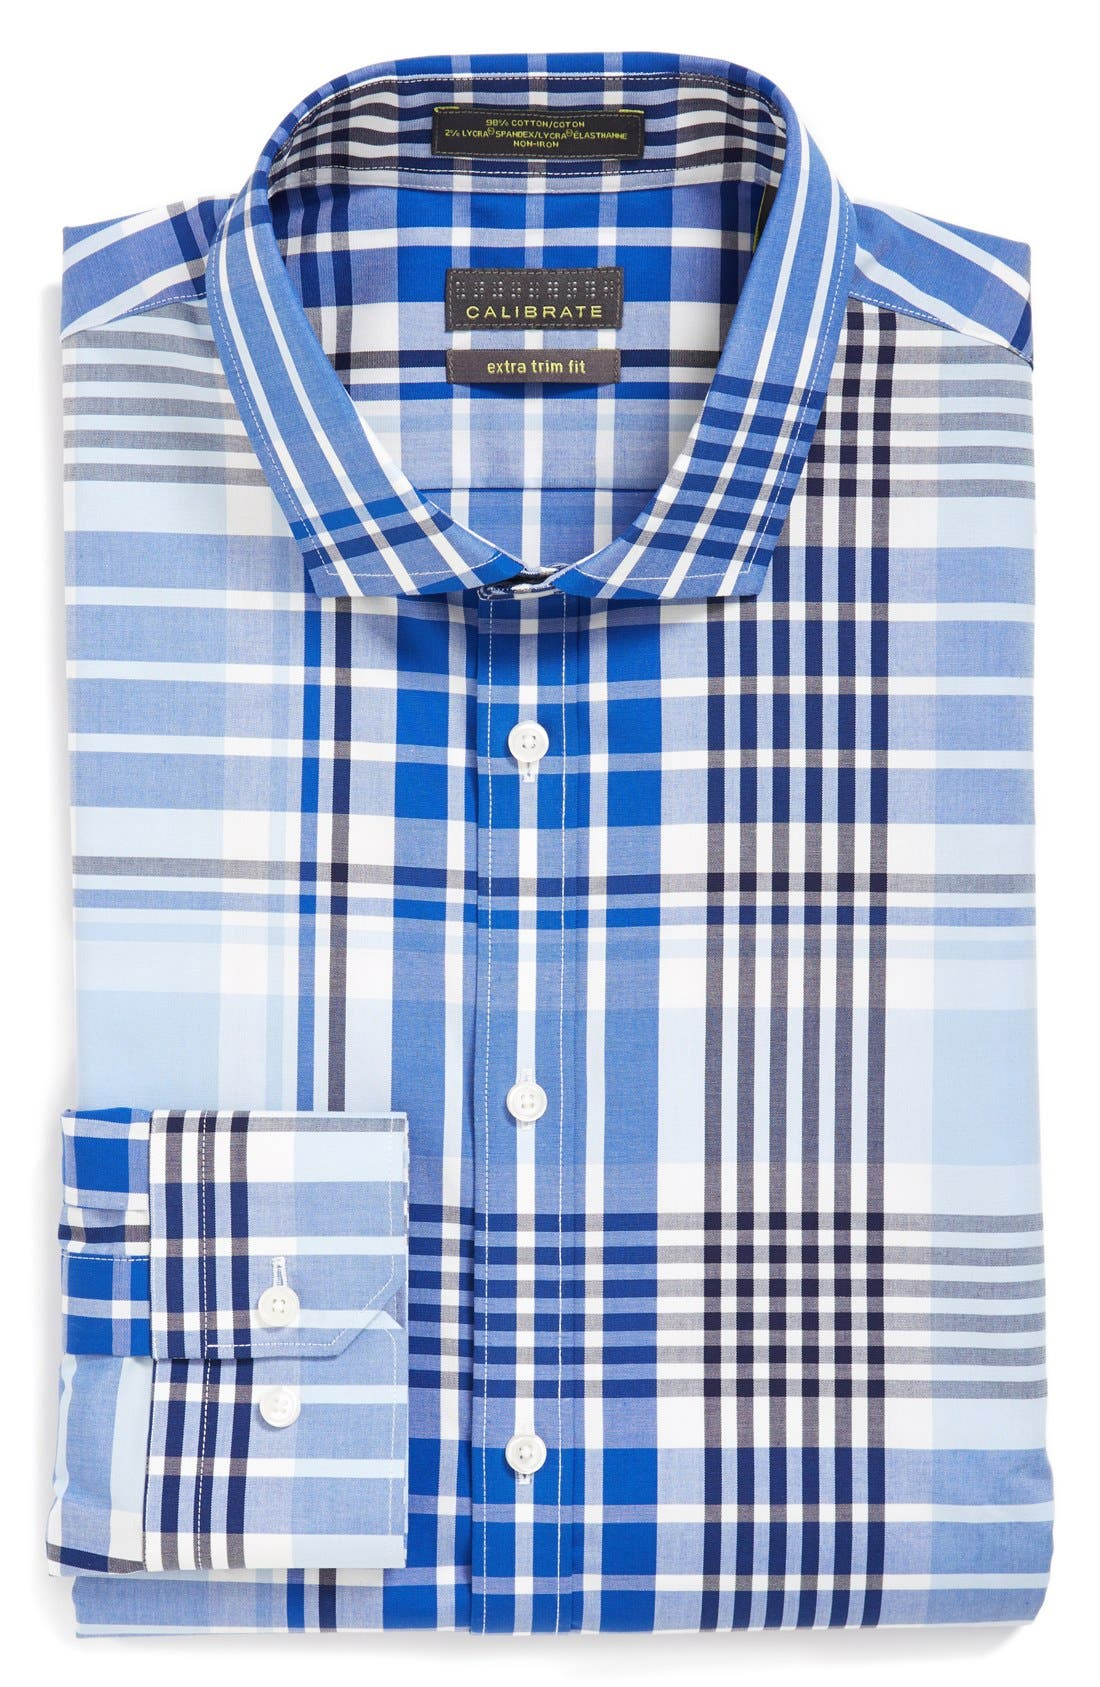 Main Image - Calibrate Extra Trim Fit Non-Iron Stretch Plaid Dress Shirt